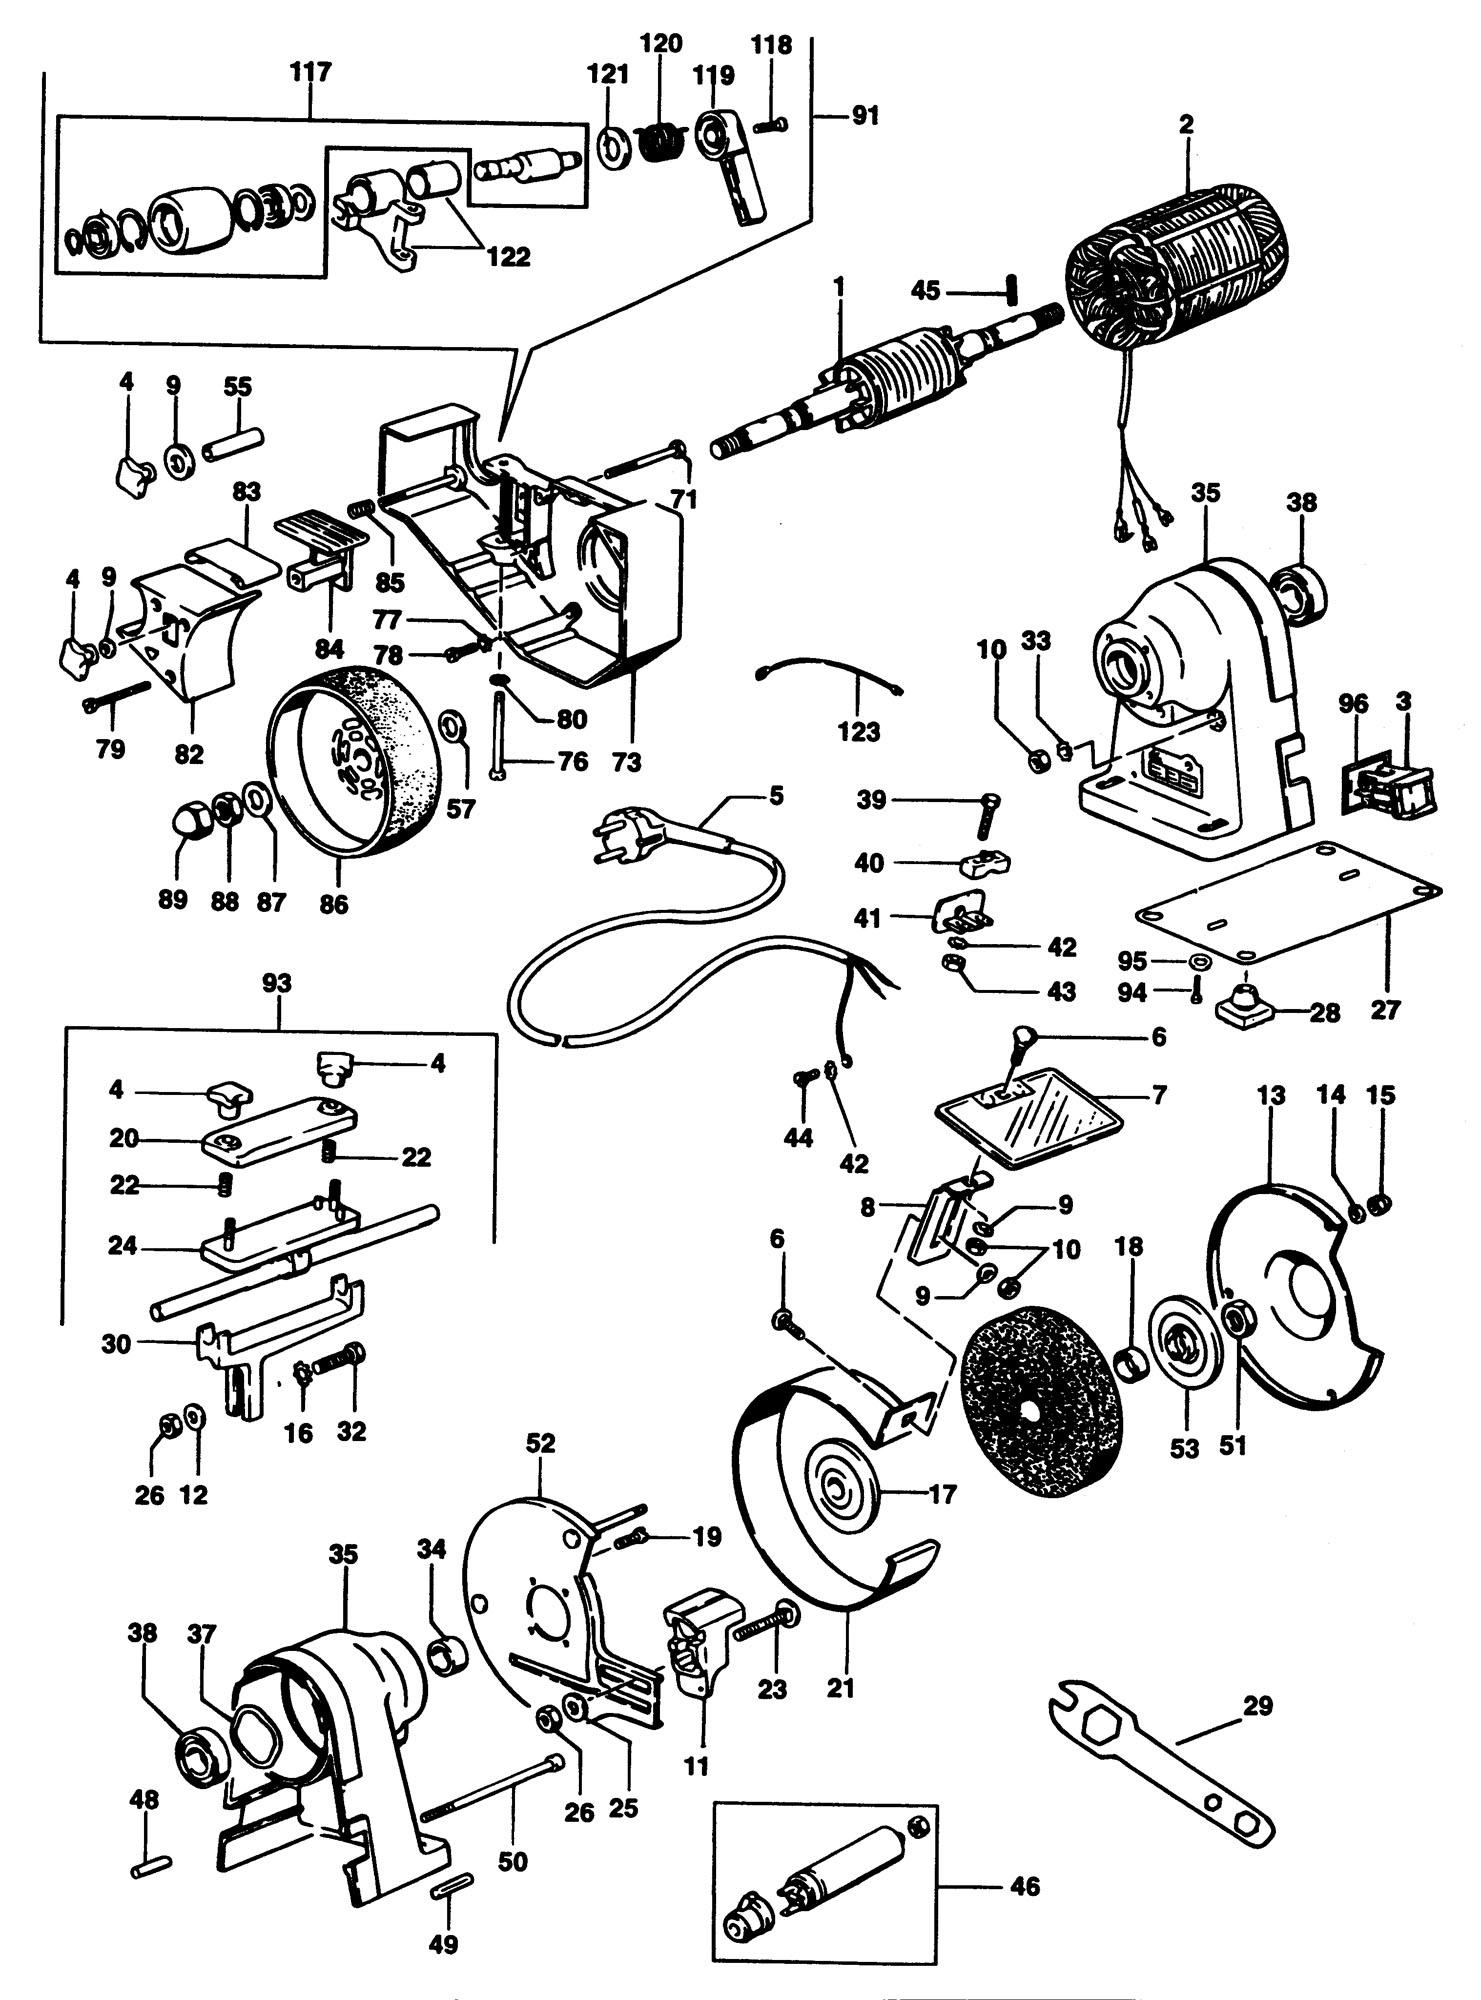 Elu Mwa149 Bench Grinder (type 3) SPARE_MWA149/TYPE_3 from